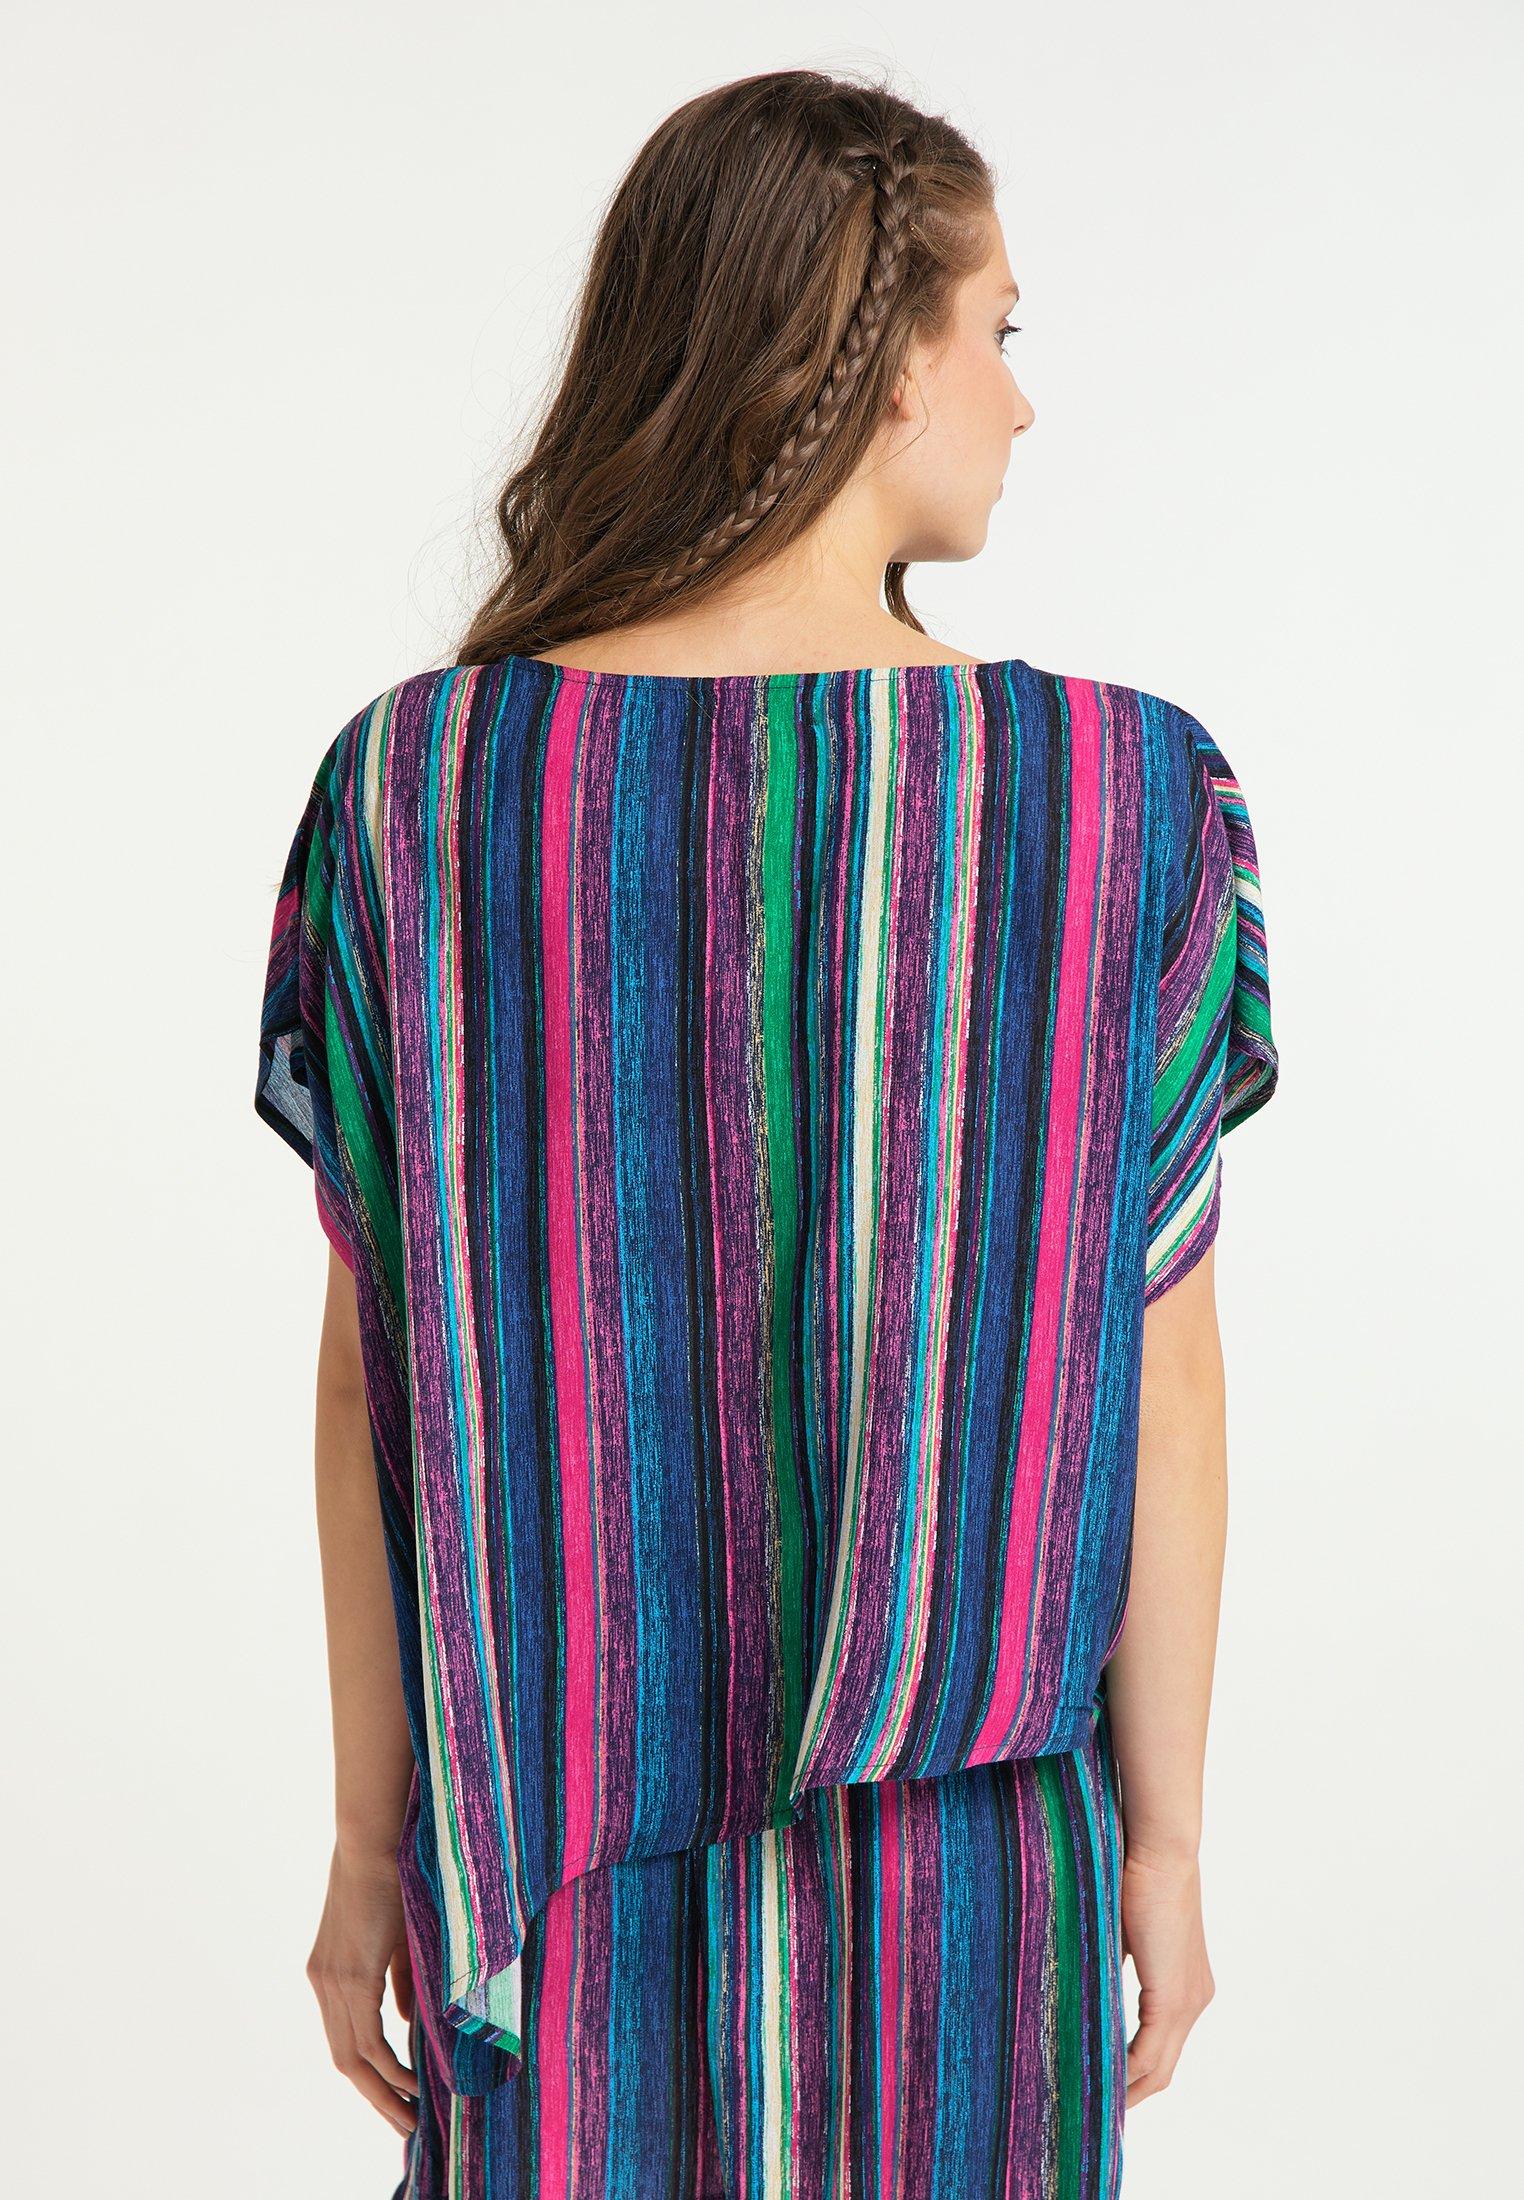 IZIA Blouse - multicolor gestreift - Tops & T-shirts Femme UtuQj